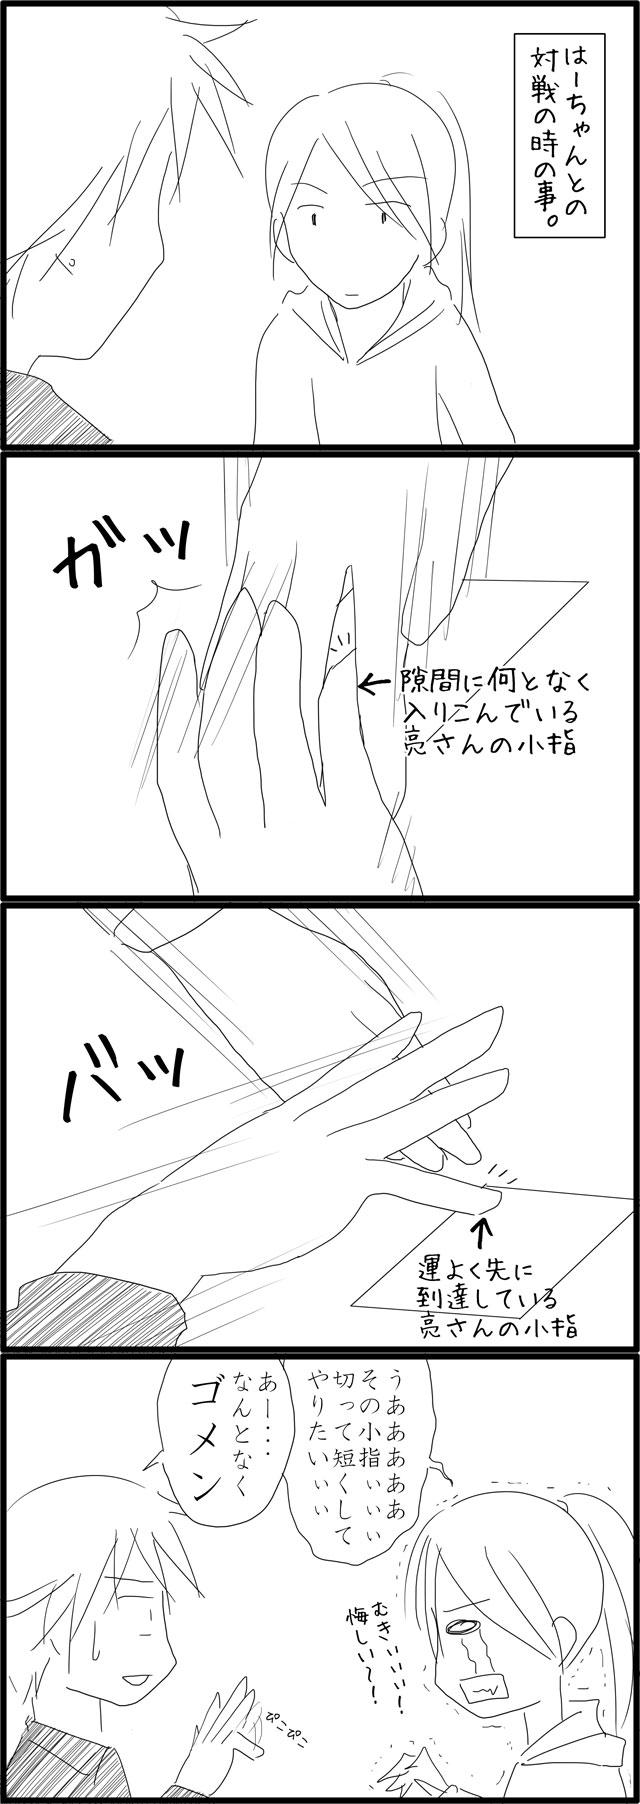 f:id:karutaru:20130203211416j:image:w480